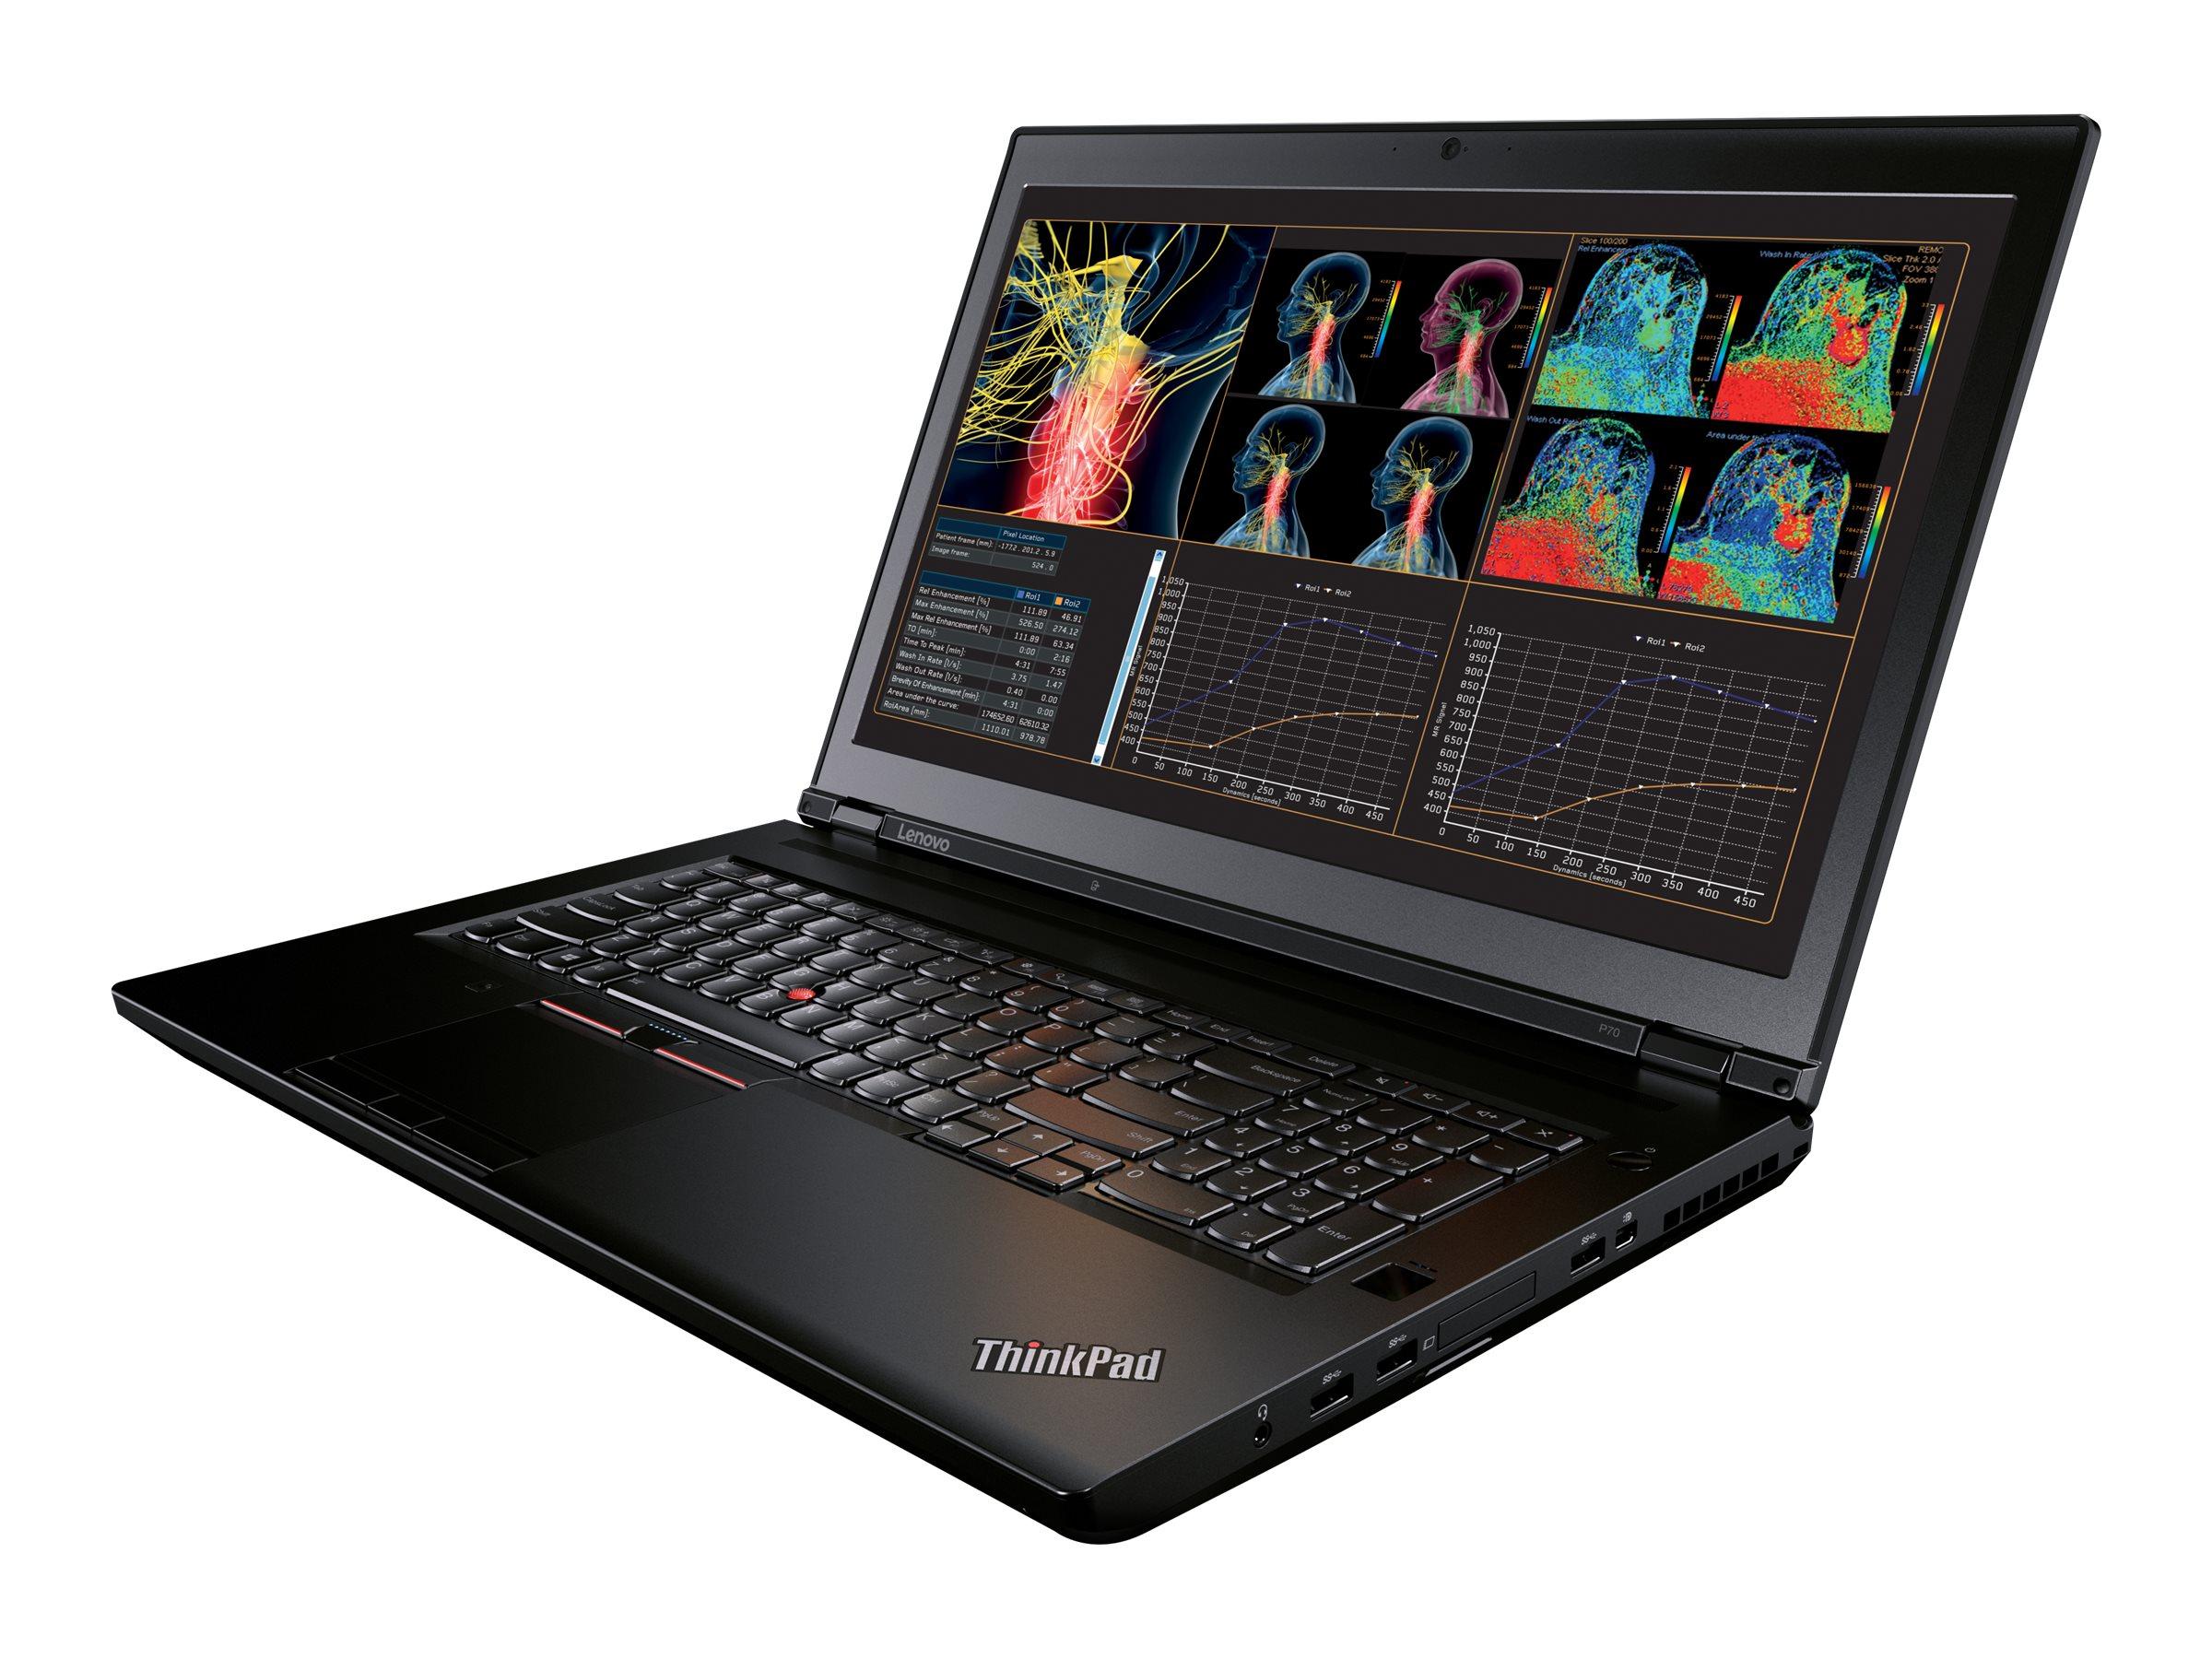 Lenovo TopSeller ThinkPad P70 Core i7-6700HQ 2.6GHz 16GB 500GB DVD SM ac BT FR WC M600M 17.3 FHD W7P64-W10, 20ER002KUS, 30817601, Workstations - Mobile